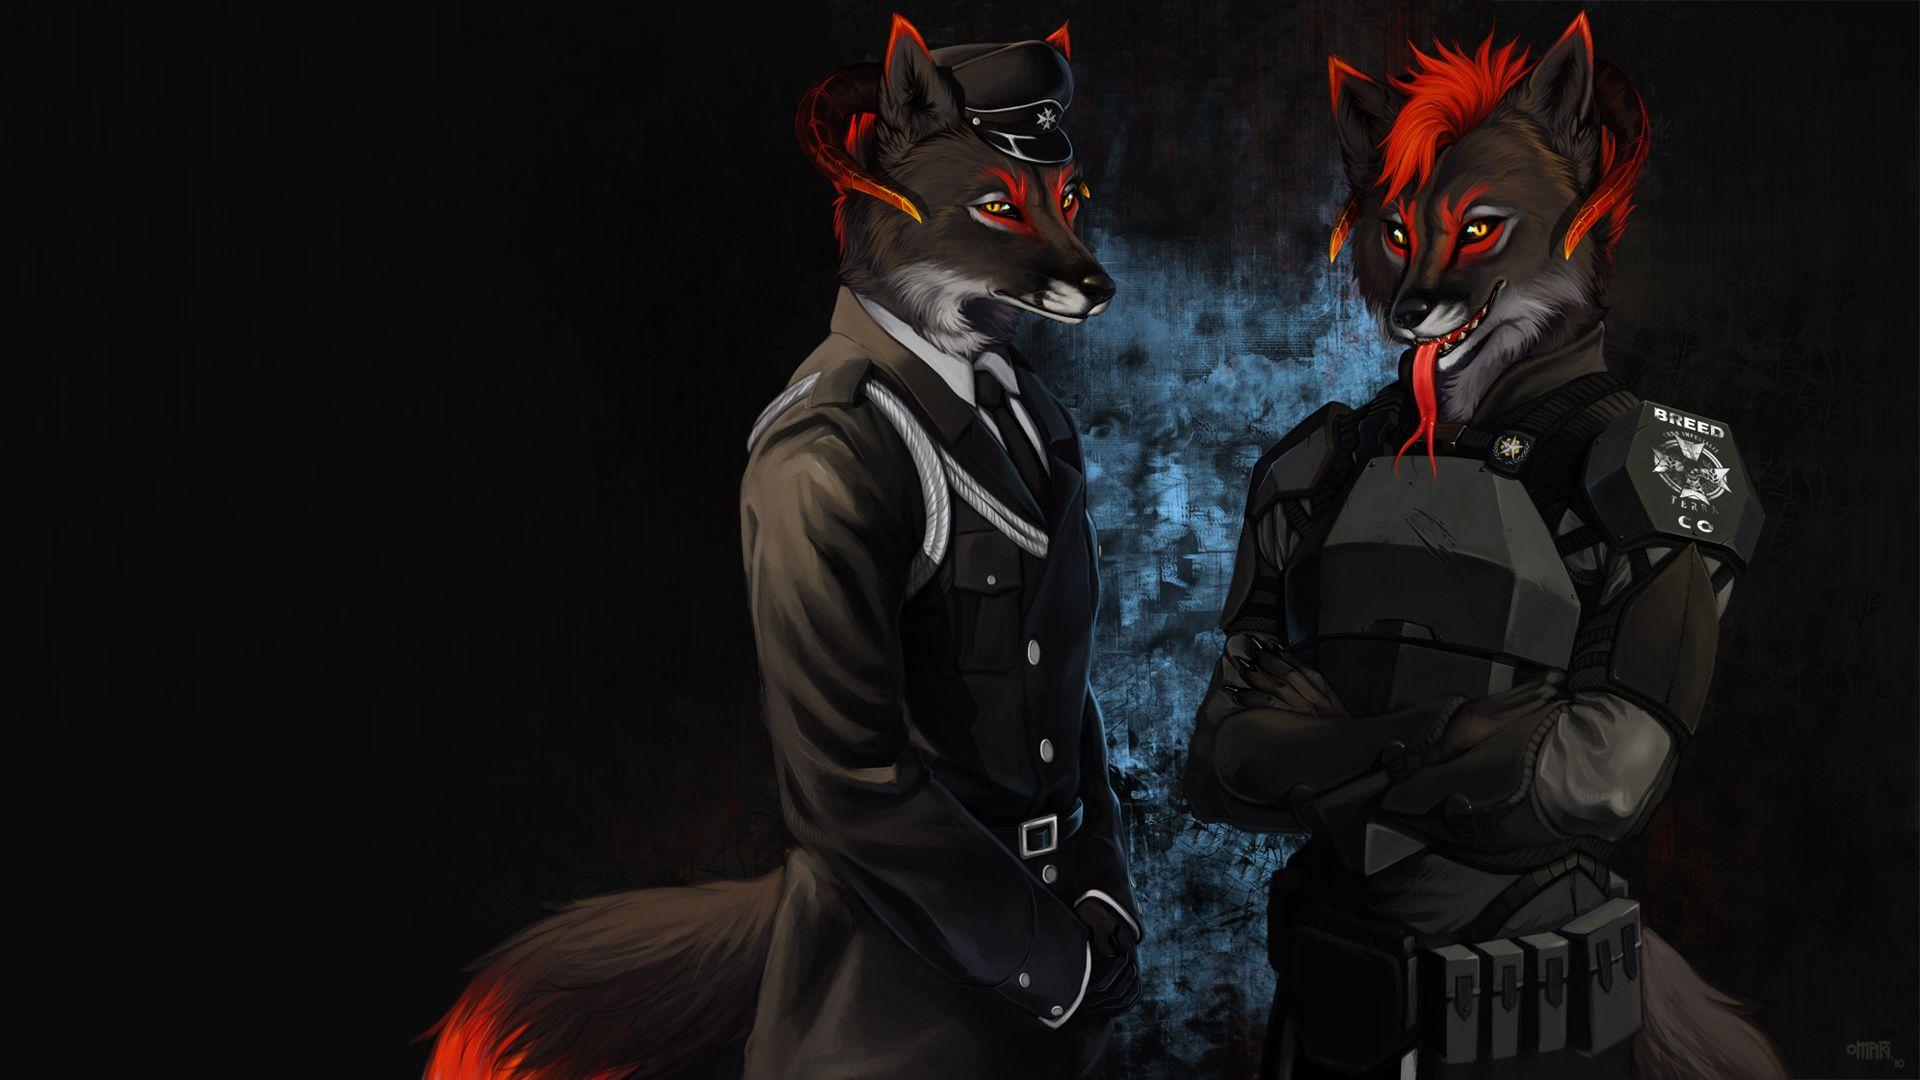 Furry Backgrounds Wallpaper